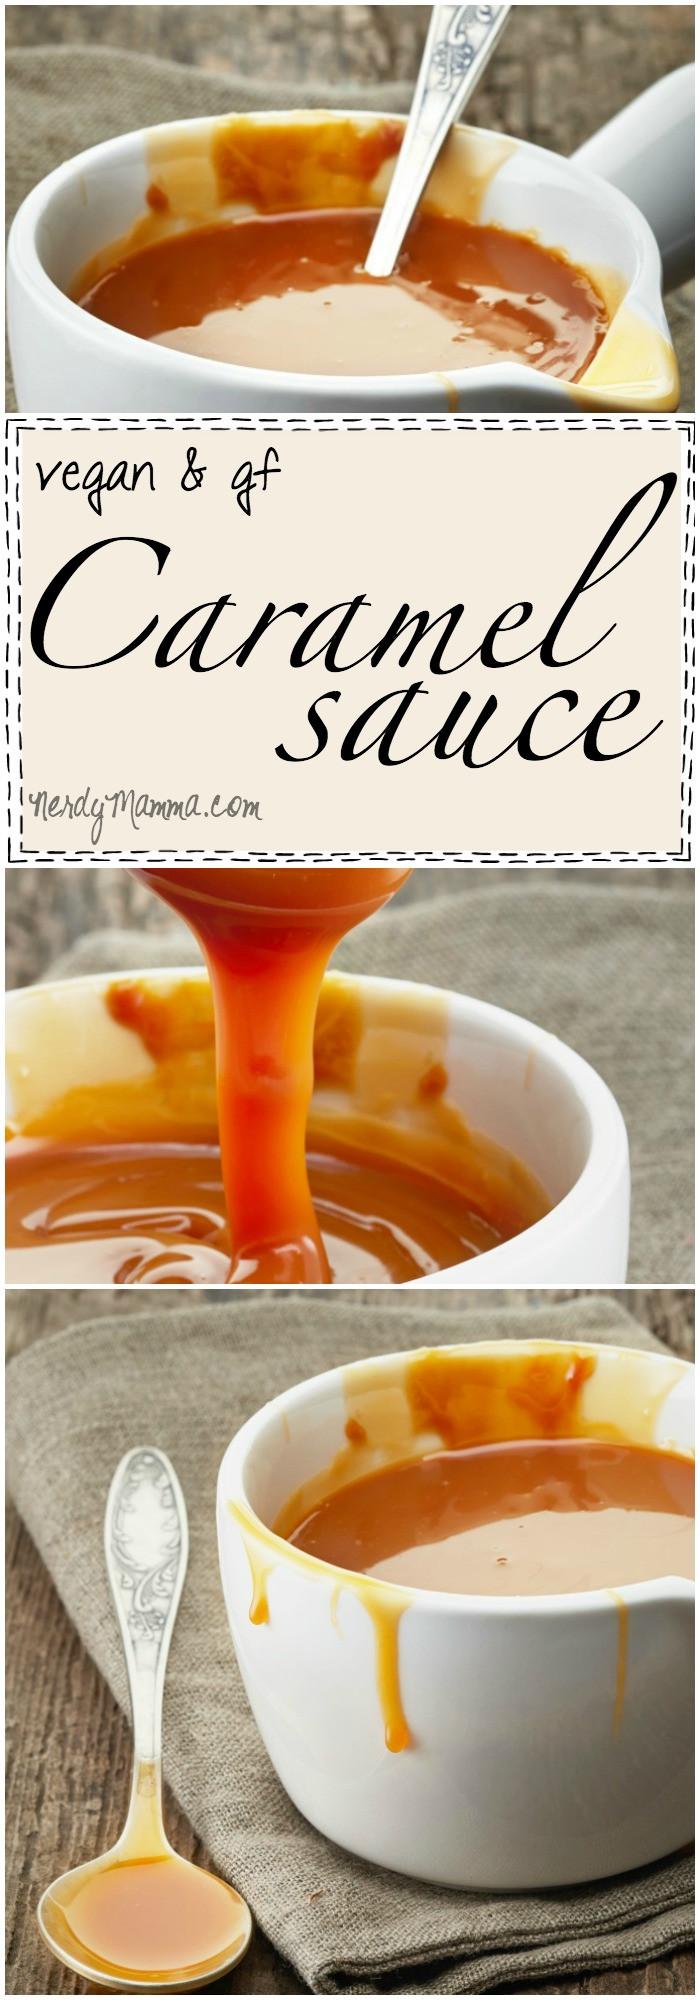 Gluten Free Sauce Recipes  Gluten Free & Vegan Caramel Sauce Nerdy Mamma